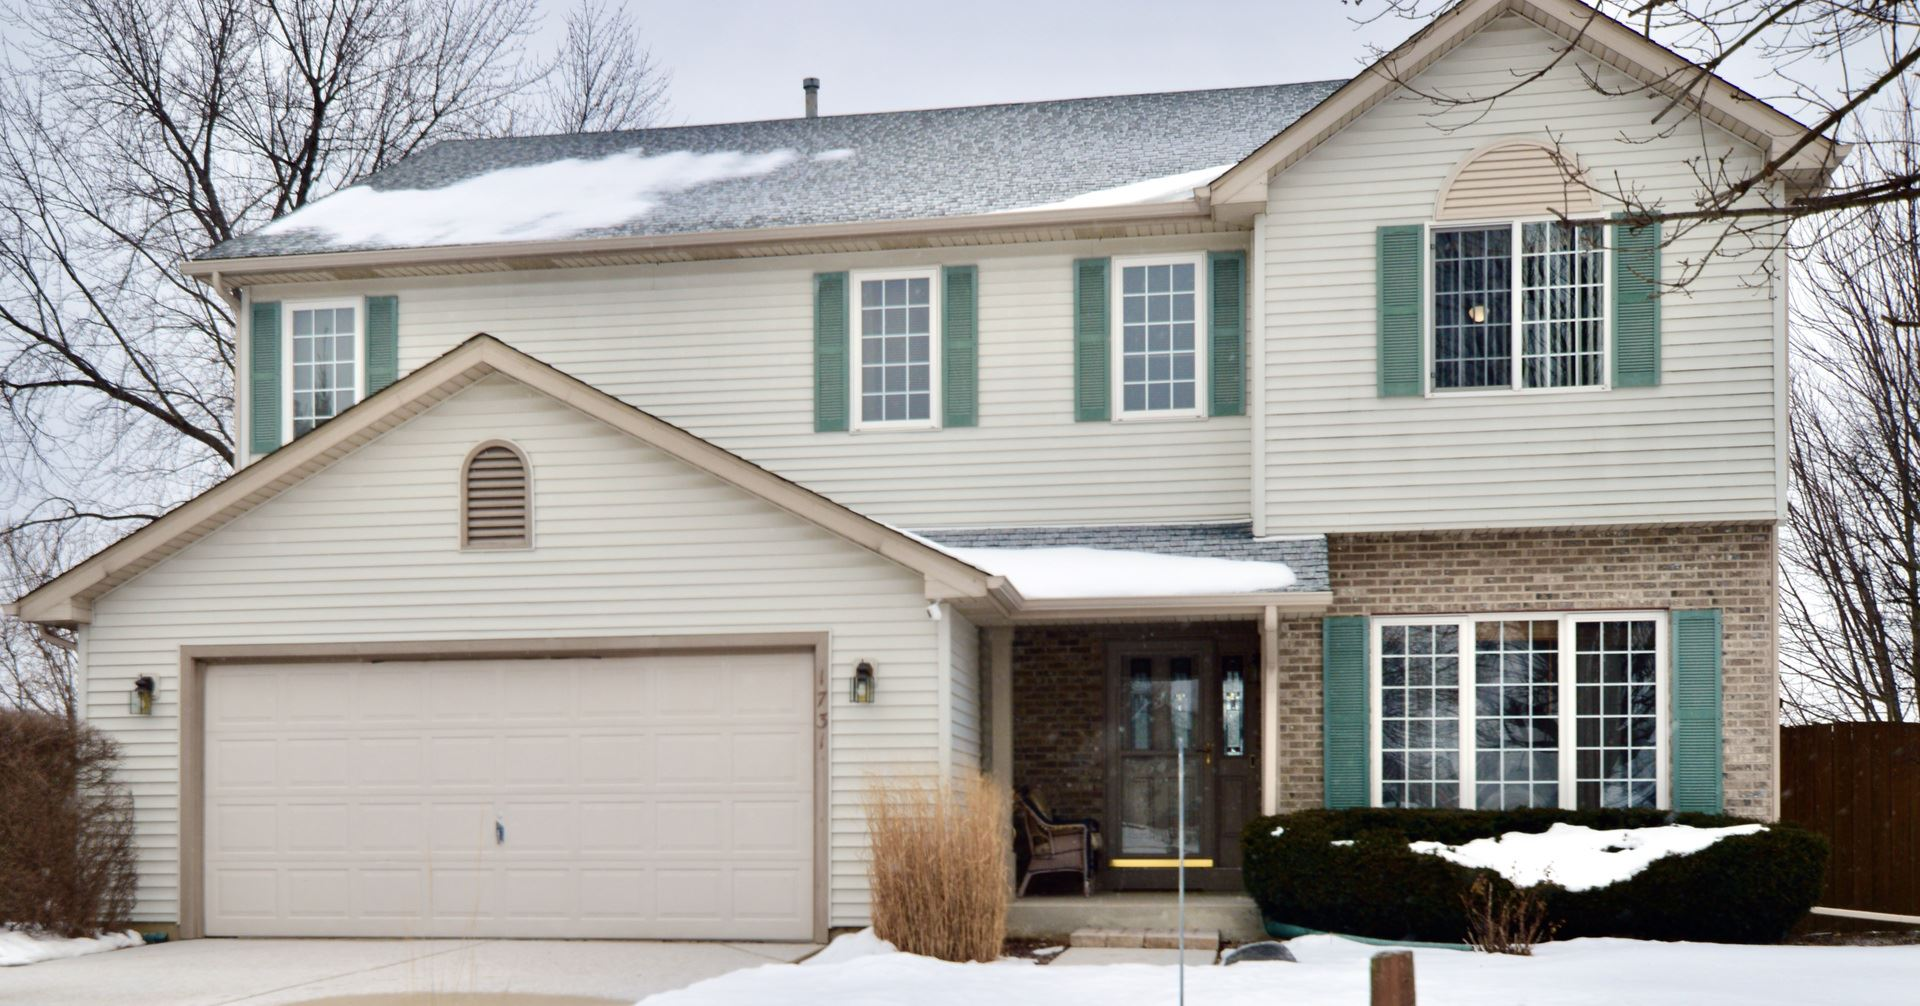 1731 REDWOOD Lane, McHenry, IL 60050 - #: 10974838